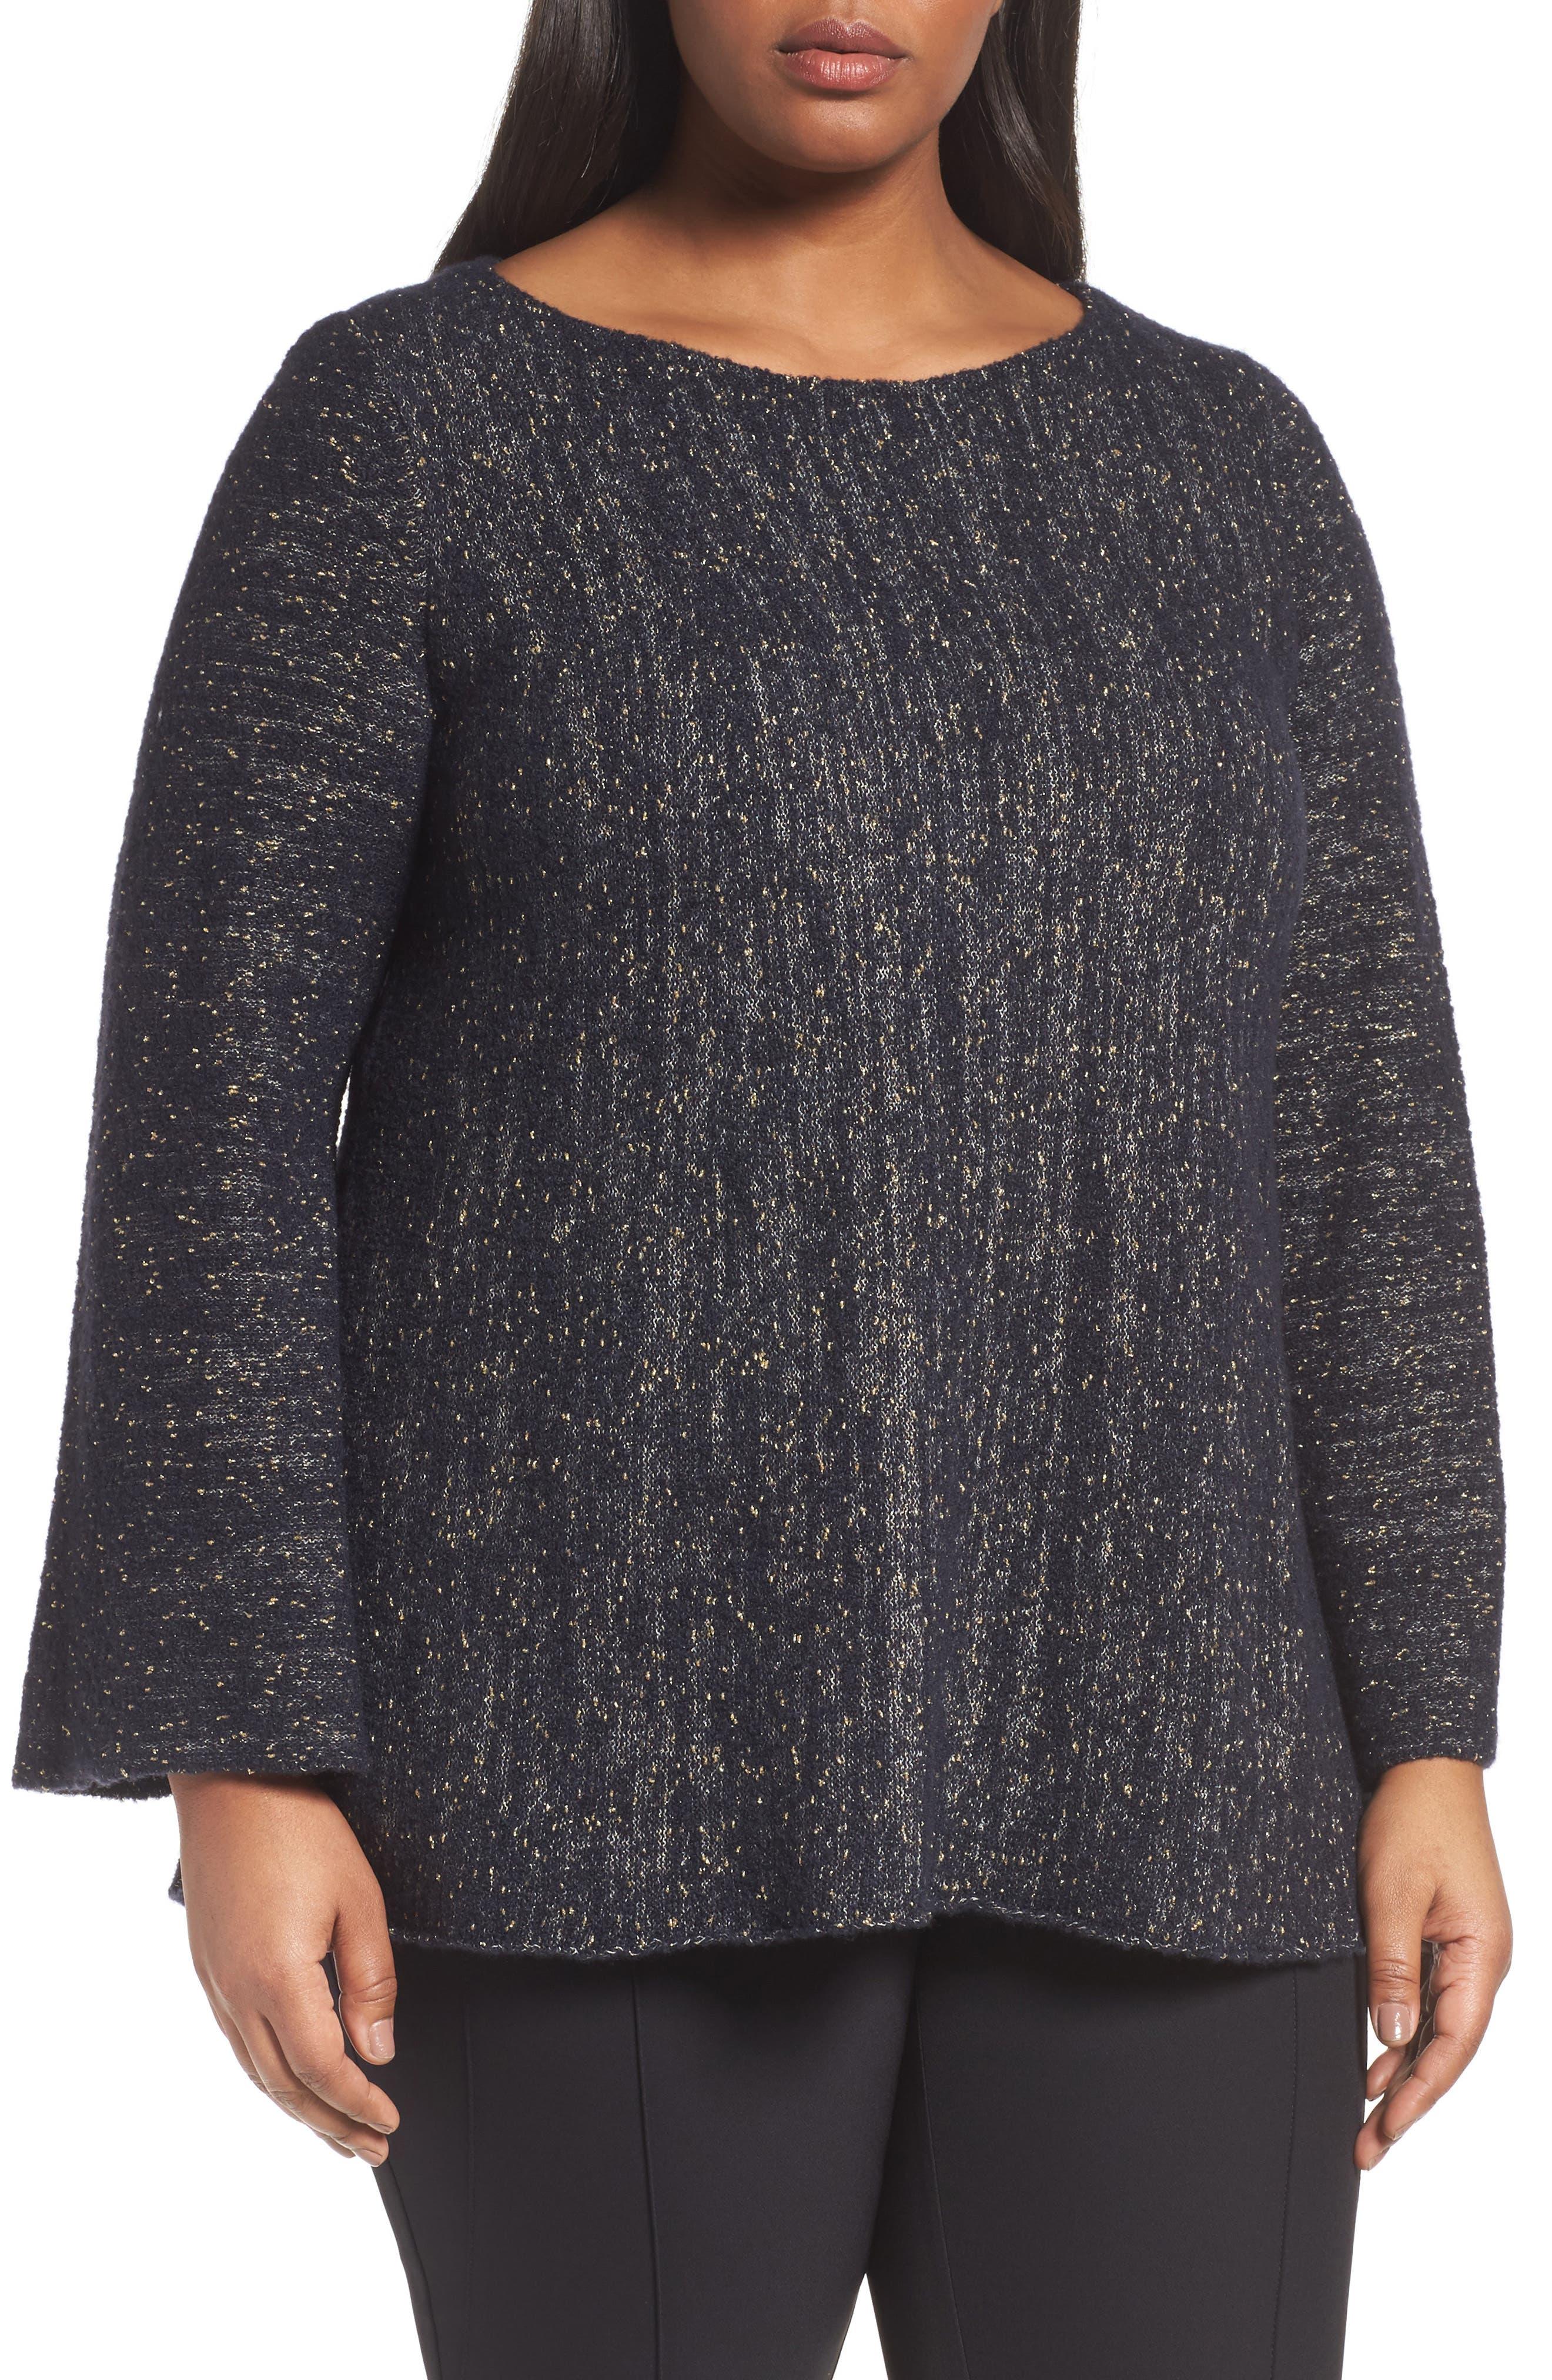 Alternate Image 1 Selected - Lafayette 148 Metallic Knit A-Line Sweater (Plus Size)